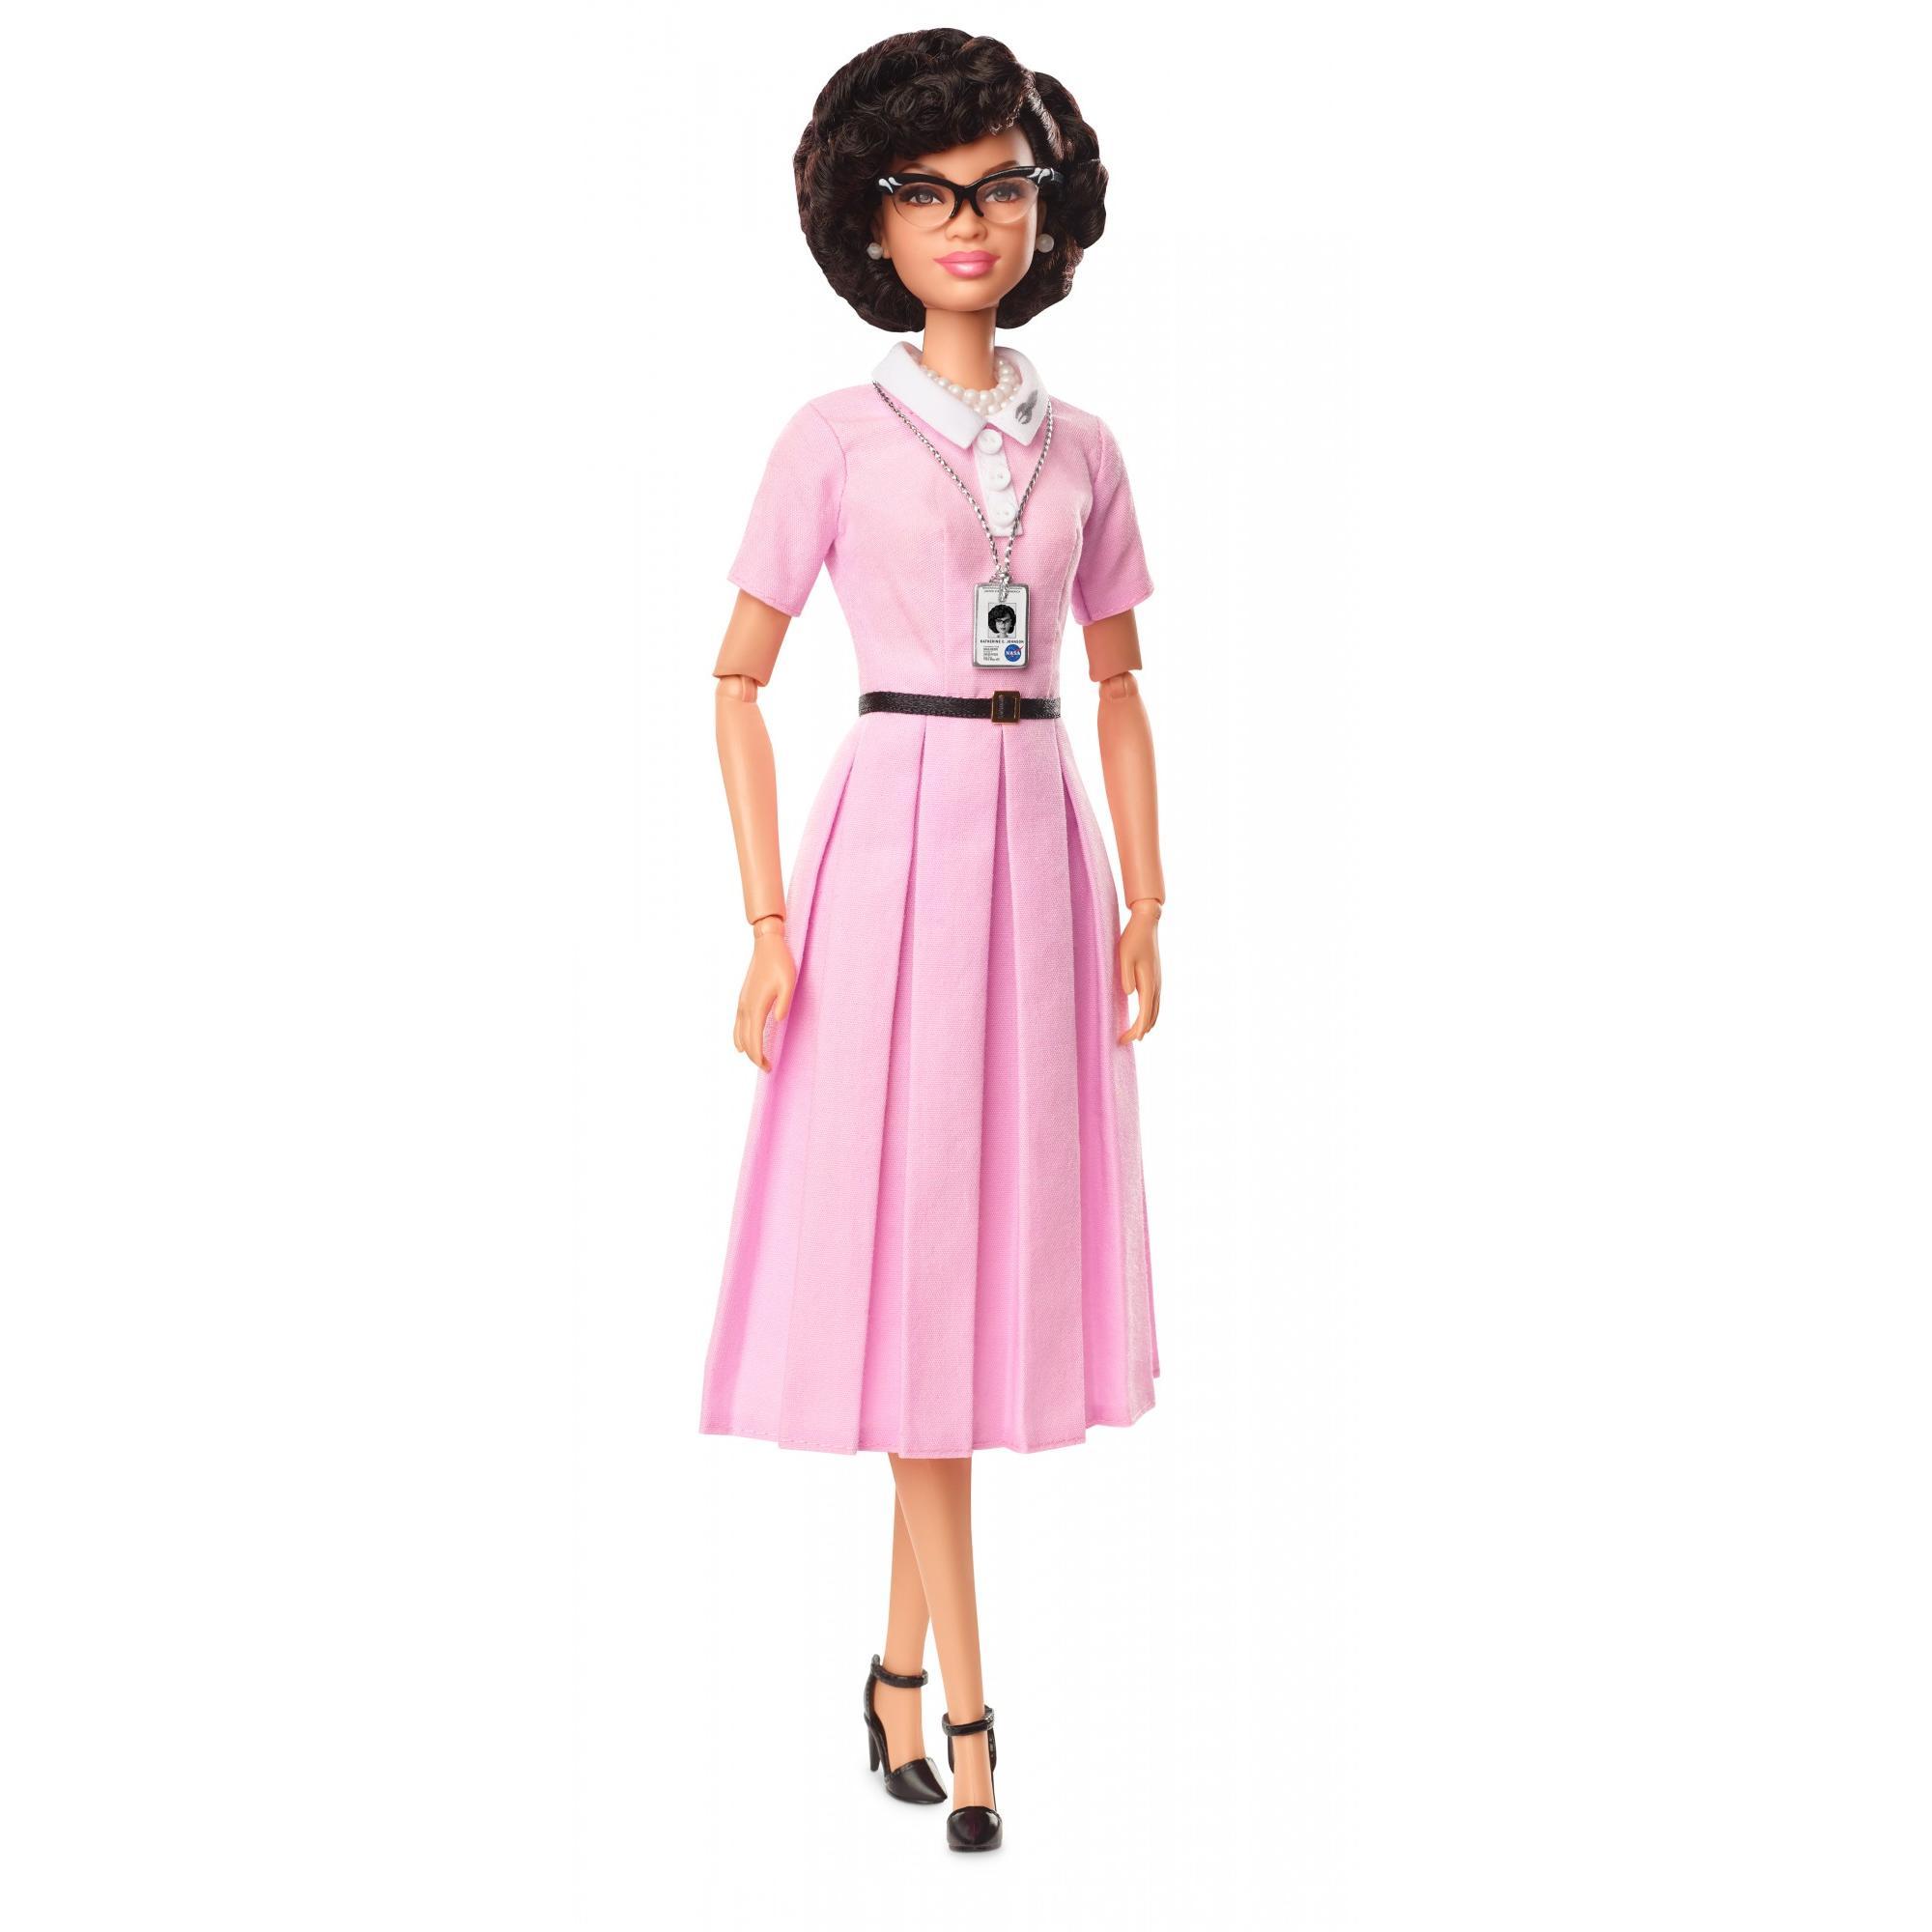 Barbie Inspiring Women Series Katherine Johnson Doll by Mattel